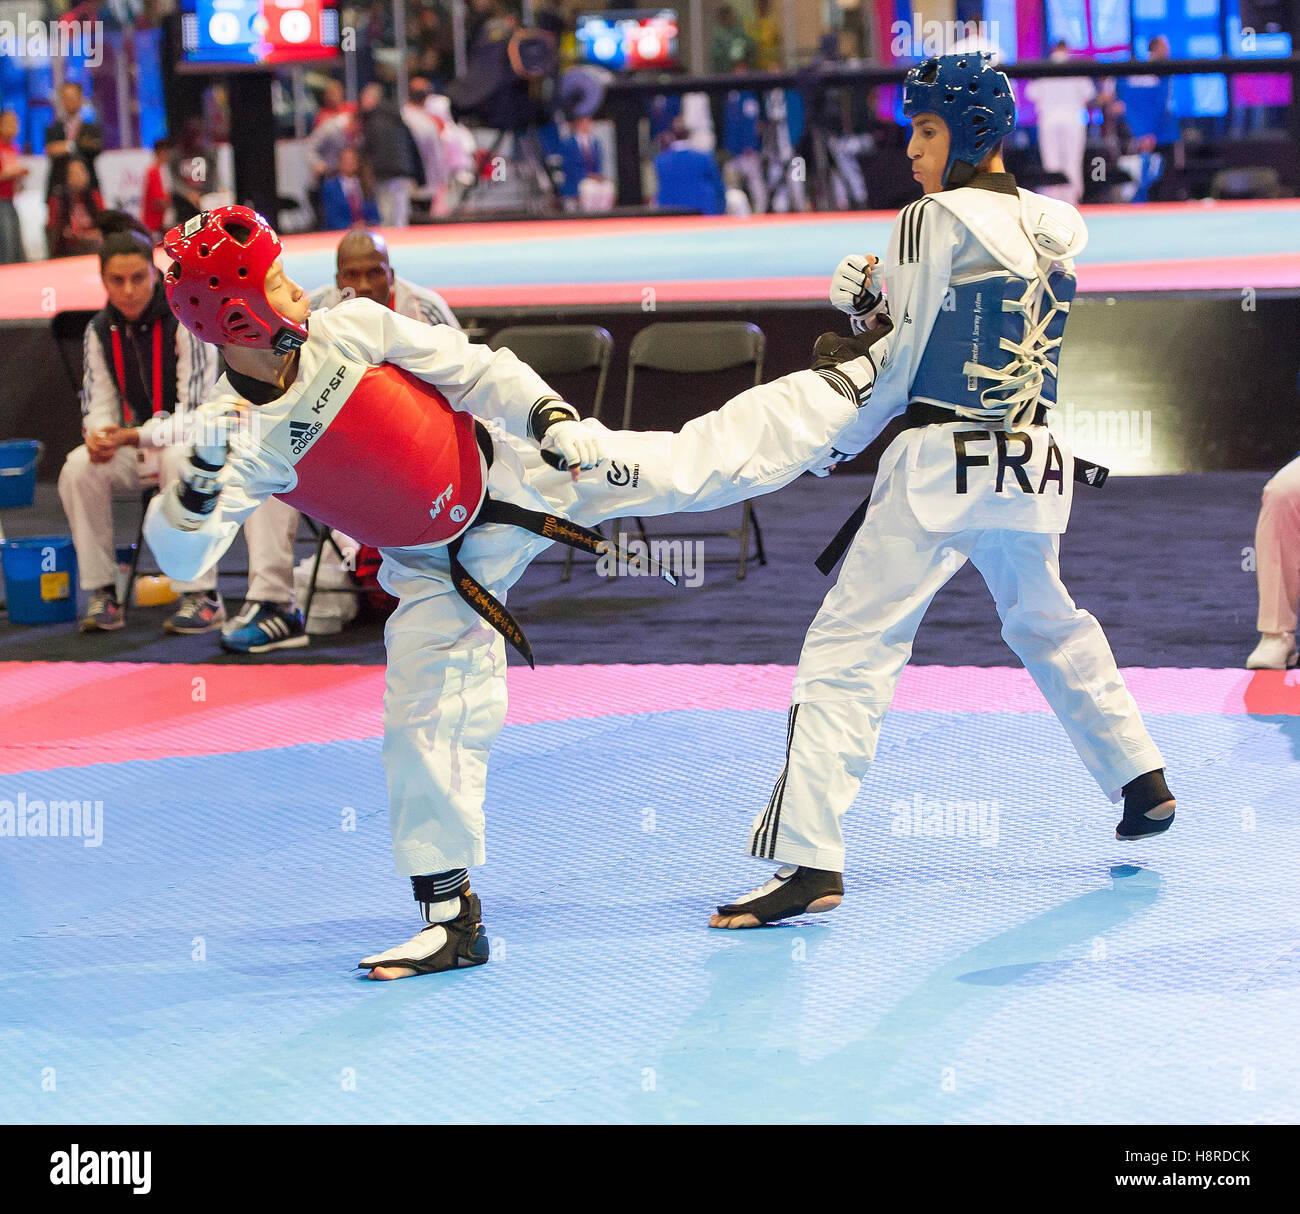 Burnaby, Canada. 16th Nov, 2016. WTF World Taekwondo Junior Championships, Zackarya Aziz (FRA) in blue and Cheng - Stock Image